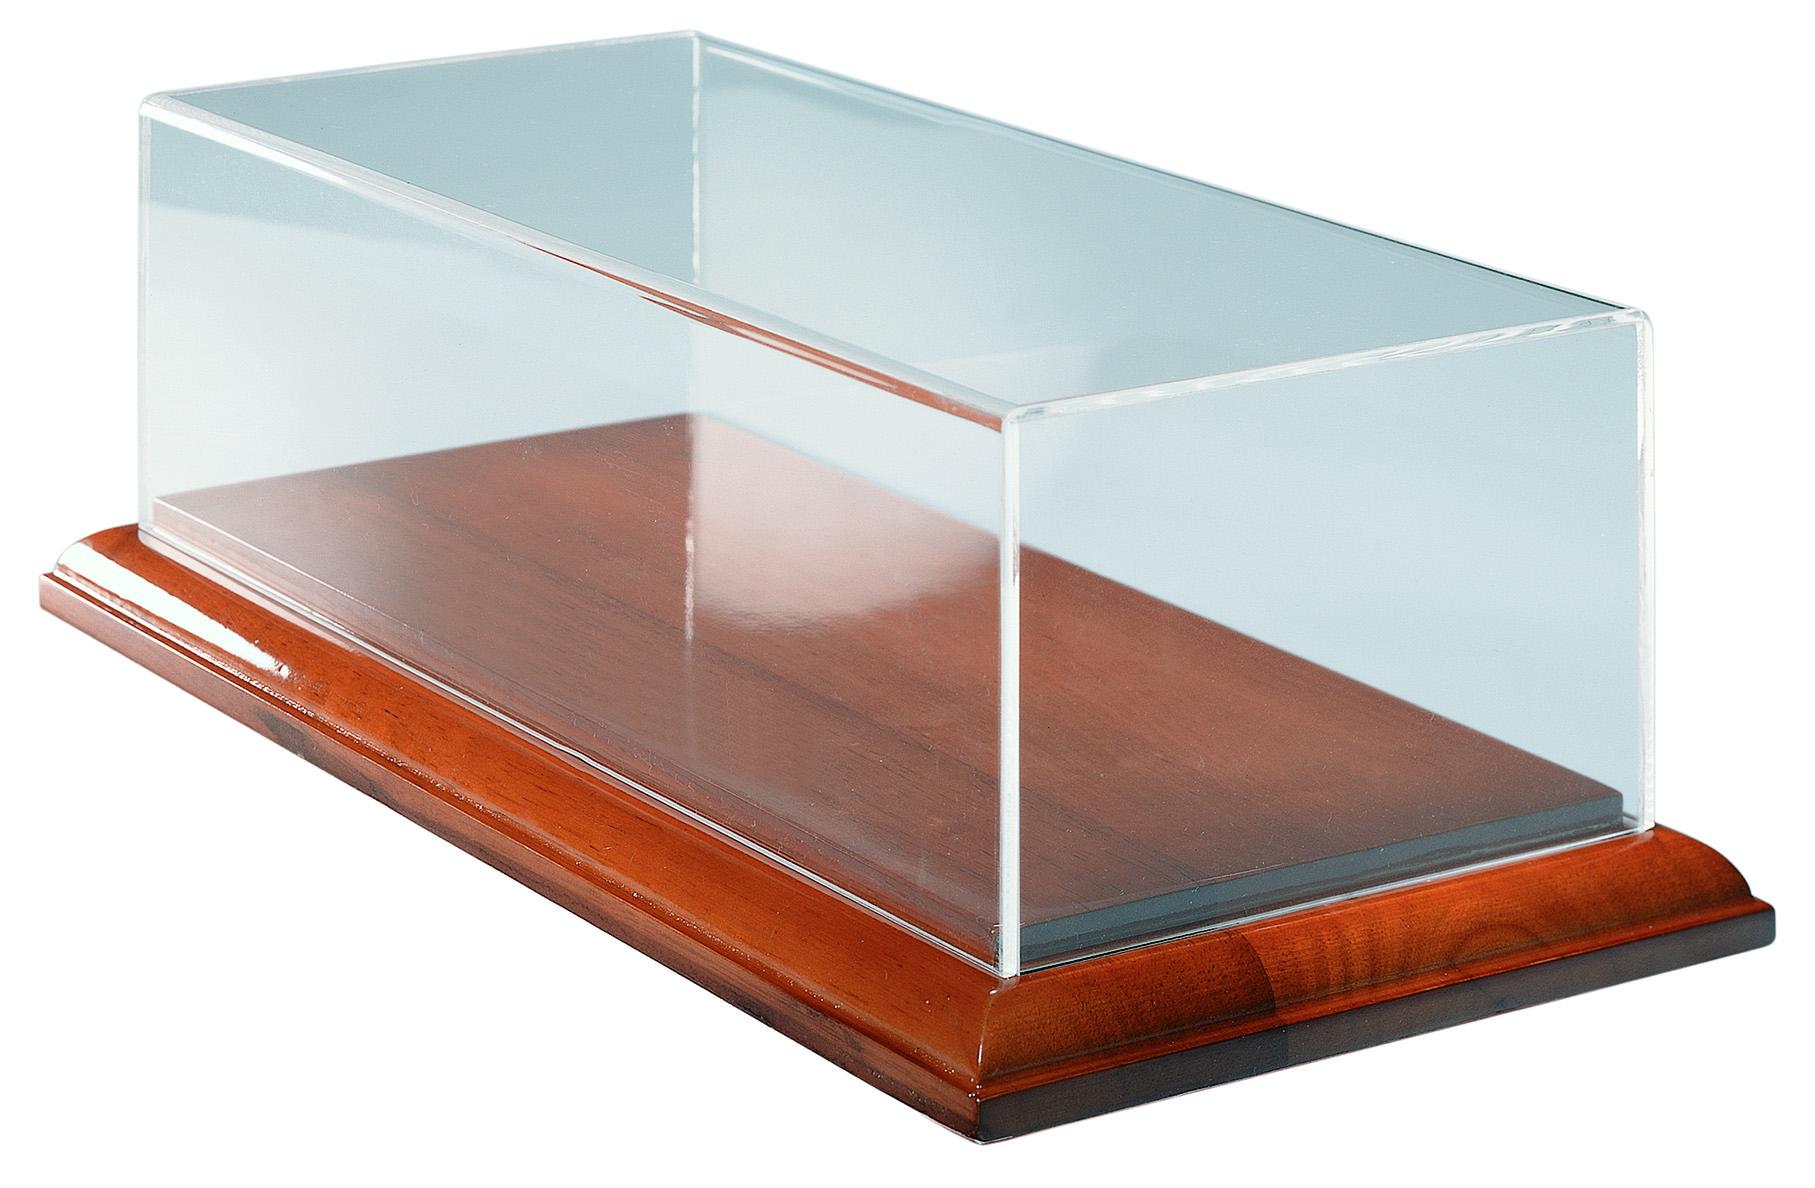 cmc praesentations vitrine fuer modelle im massstab 1 24. Black Bedroom Furniture Sets. Home Design Ideas